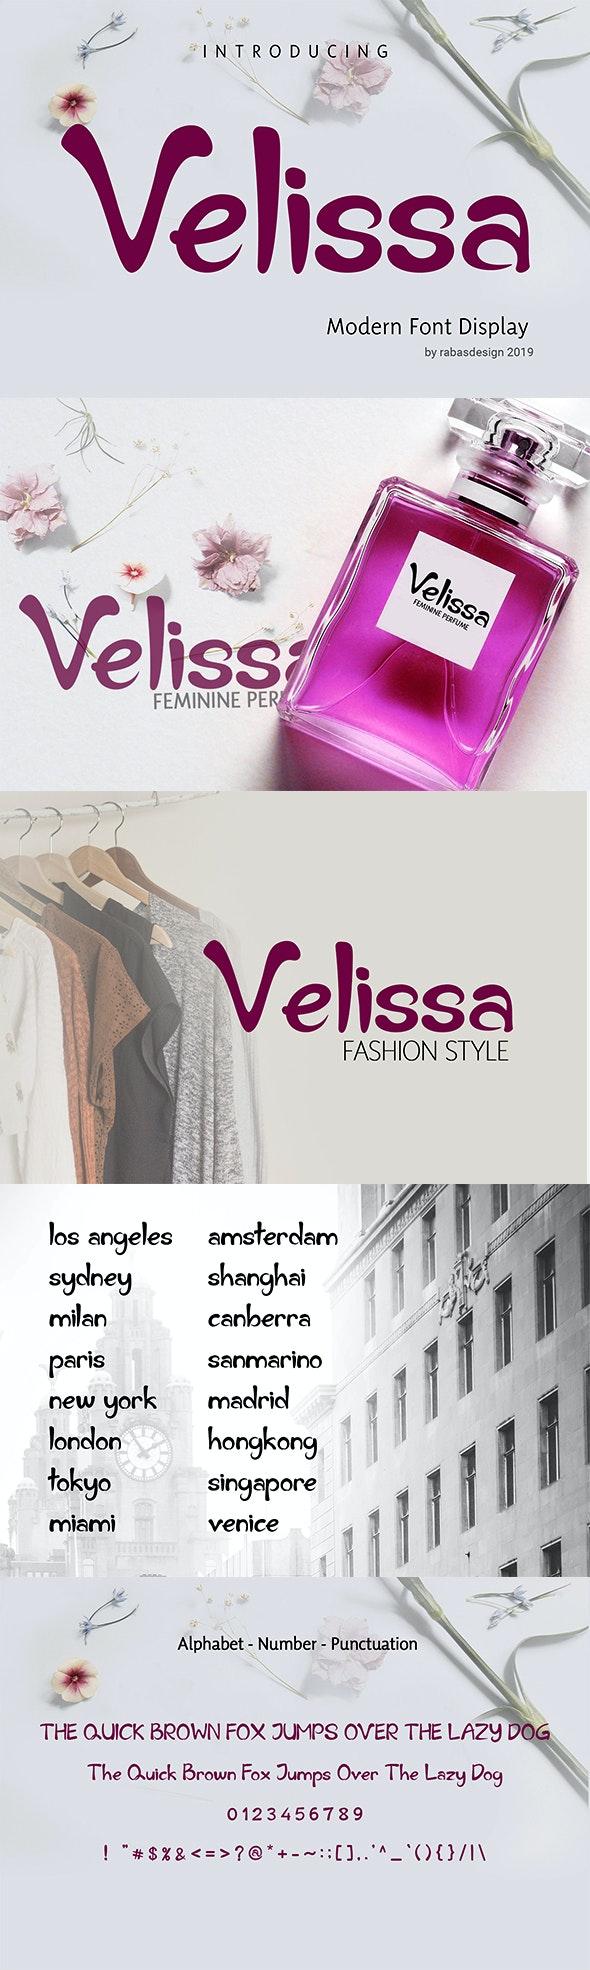 Velissa - Decorative Fonts